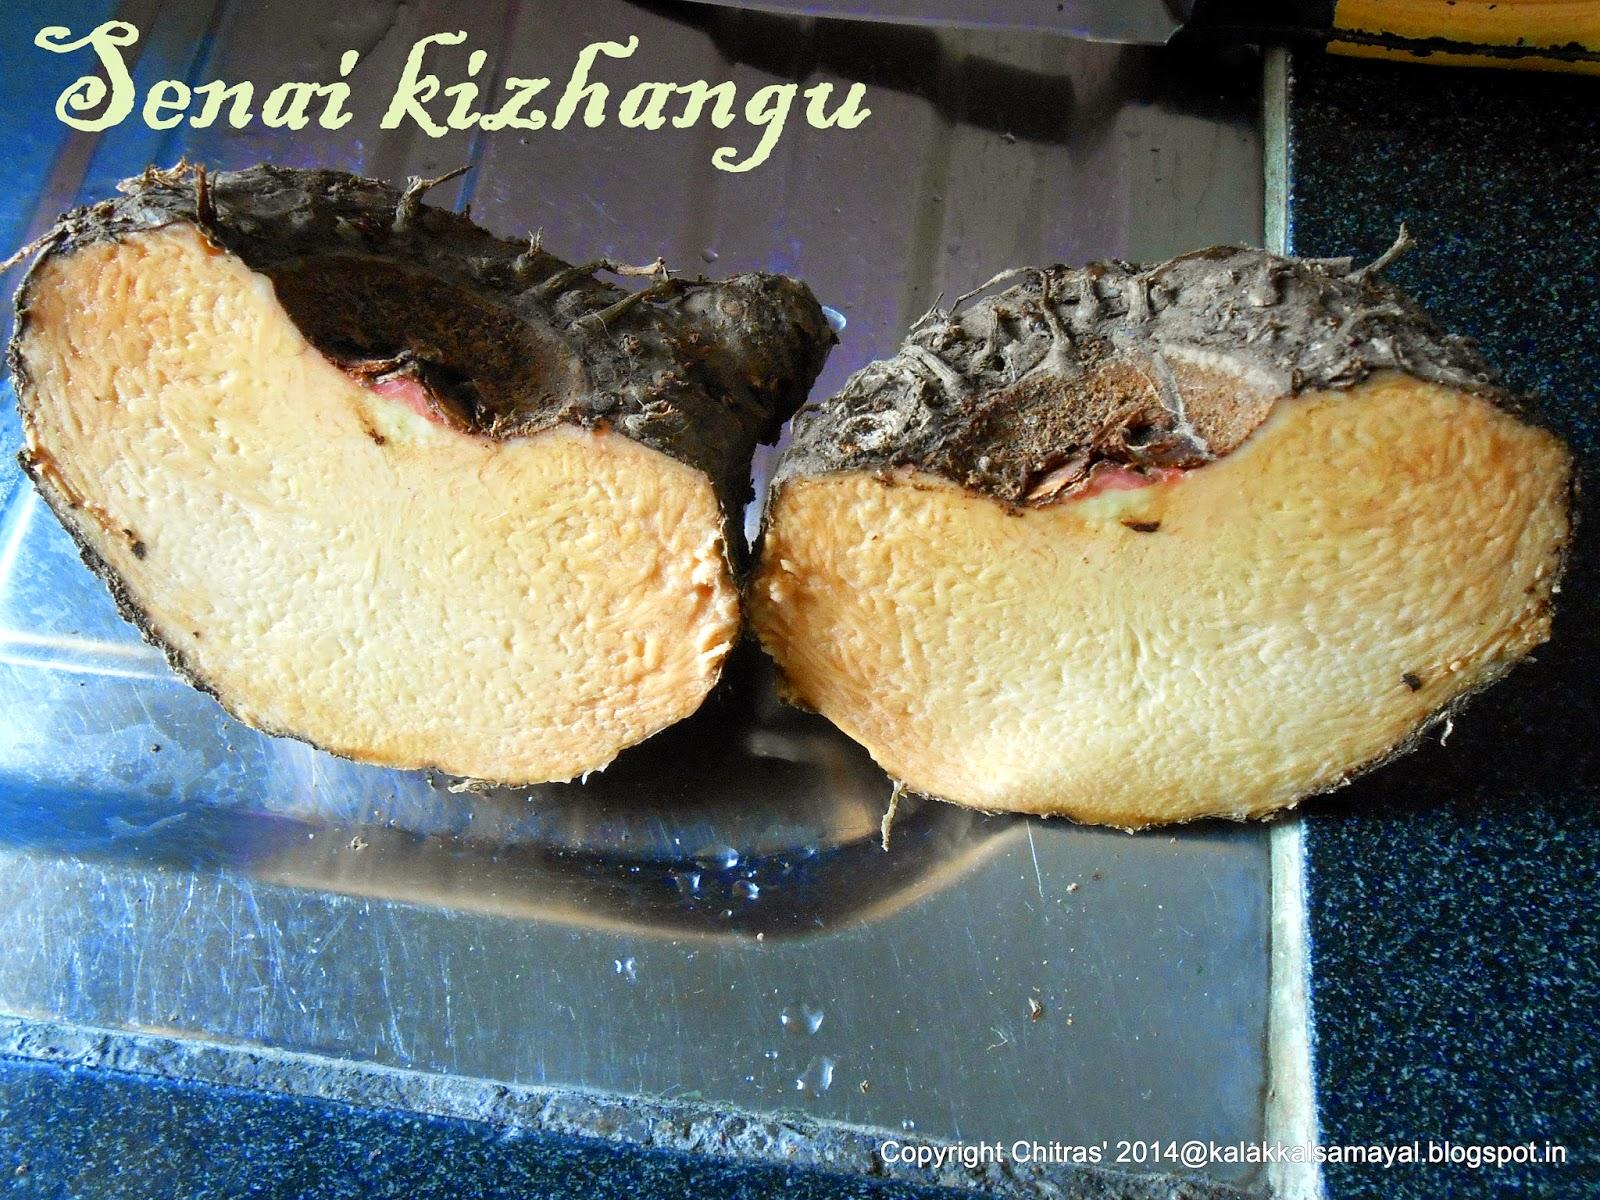 Senai Kizhangu [ Yam or Elephant Yam ]